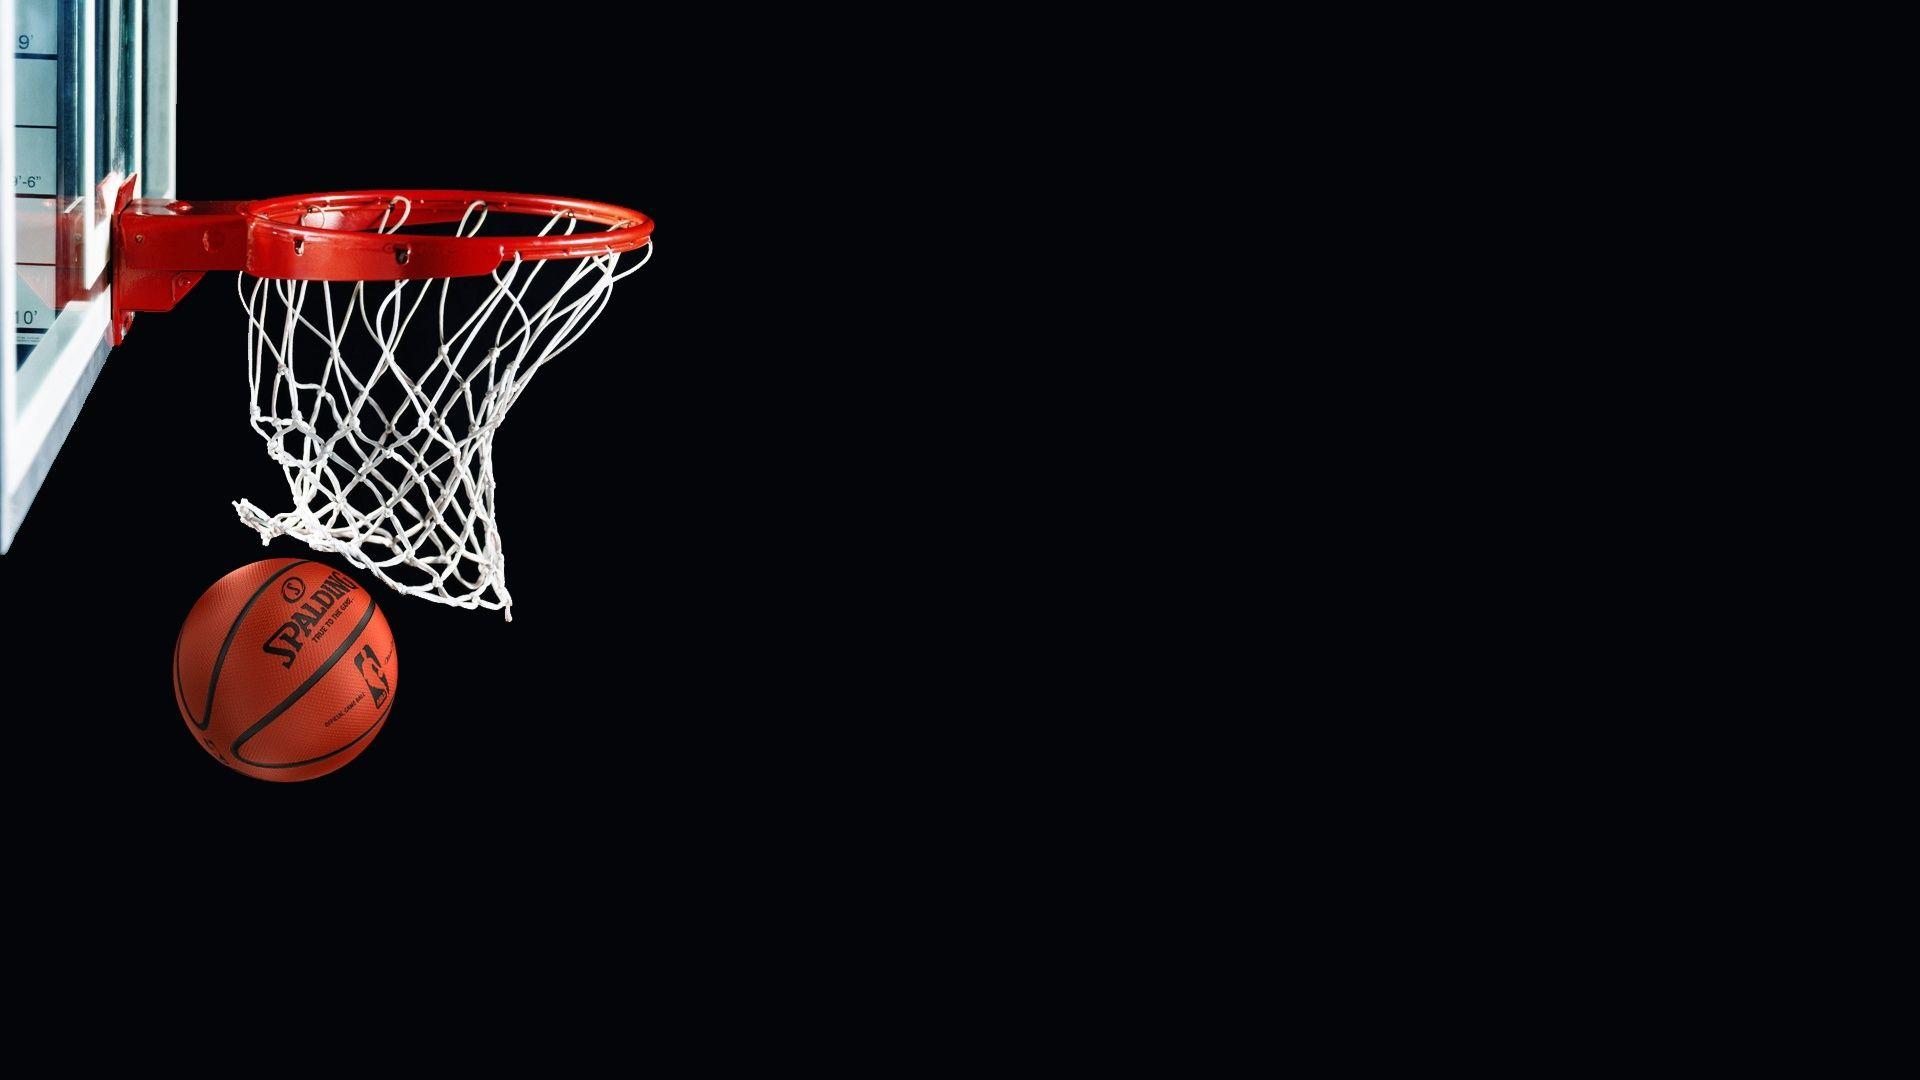 Nike Basketball Cool HD Wallpaper